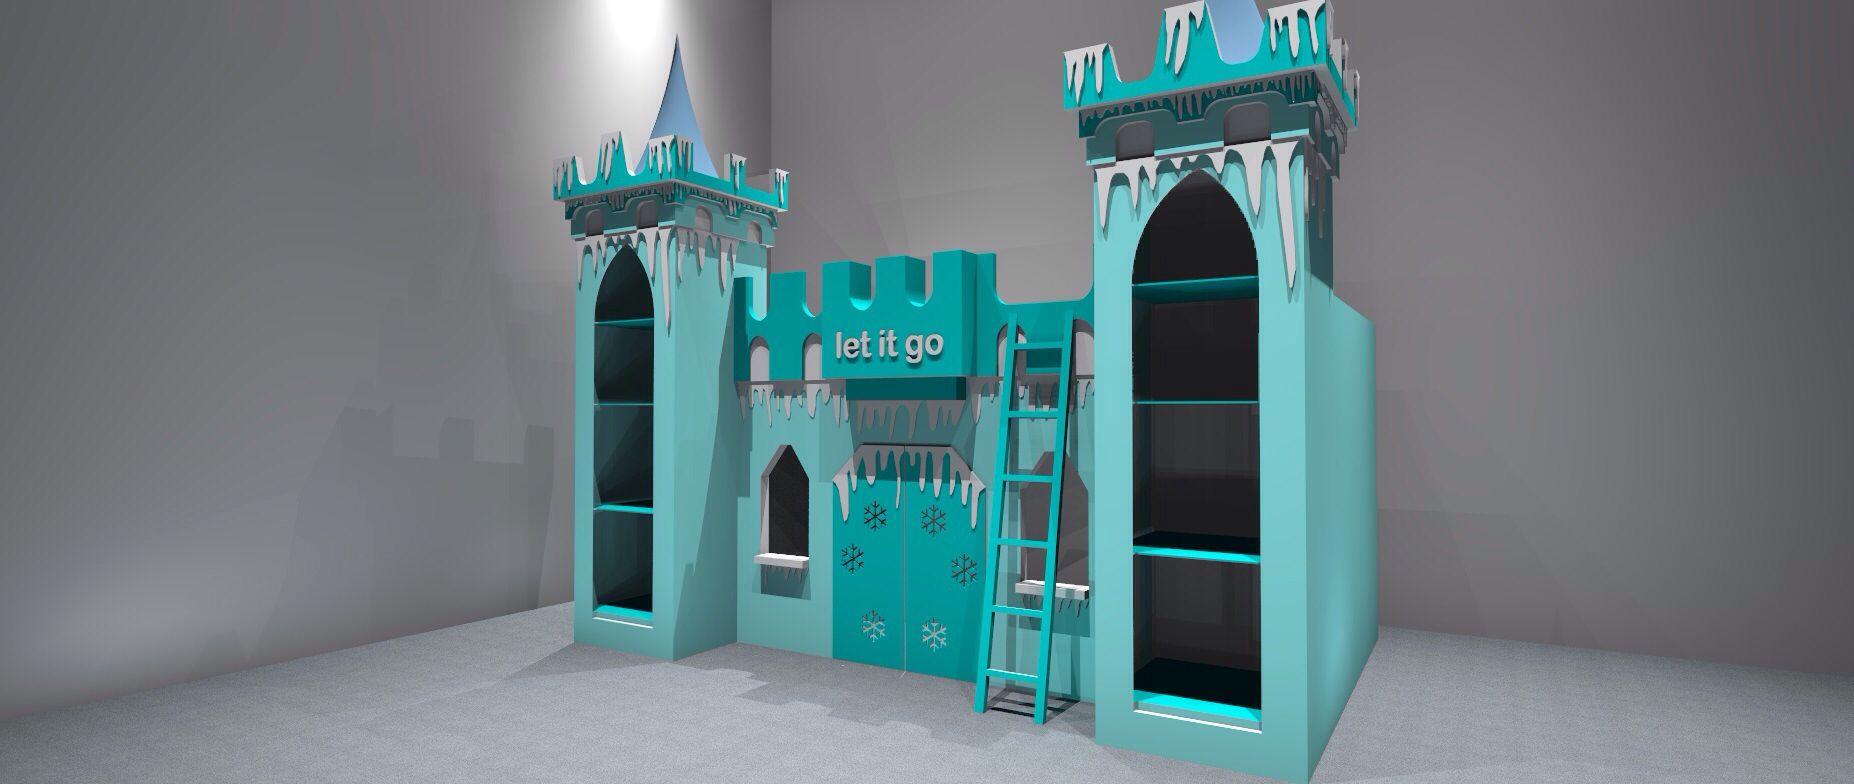 Cheap Bedroom Sets Kids Elsa From Frozen For Girls Toddler: Frozen Children's Bed By Www.dreamcraftfurniture.co.uk